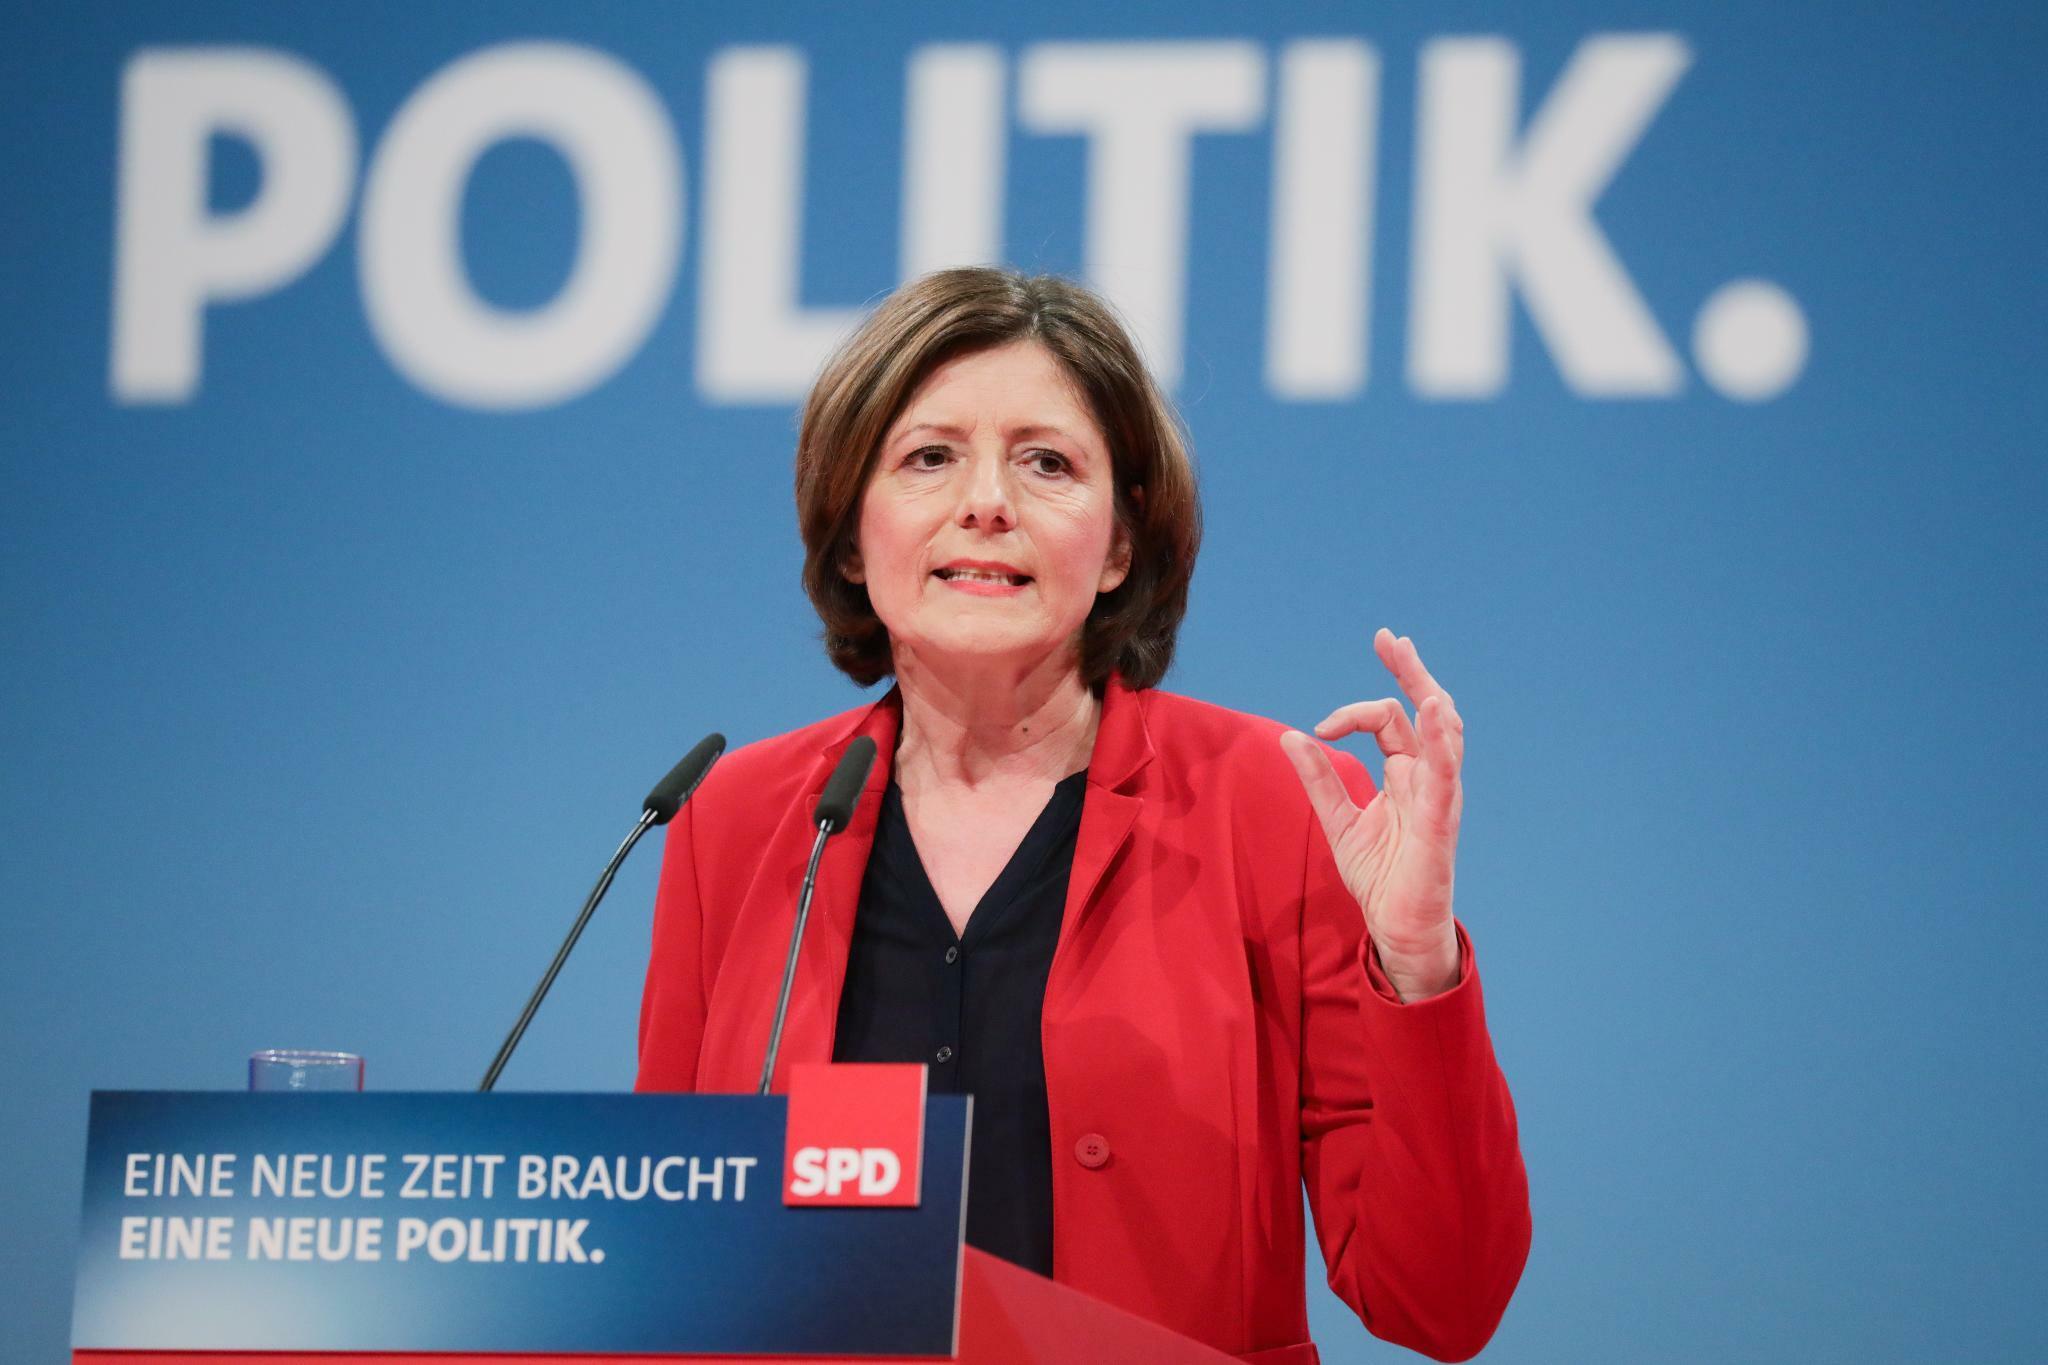 Linksbündnis-Debatte: Linkspartei begrüßt SPD-Vorstoß